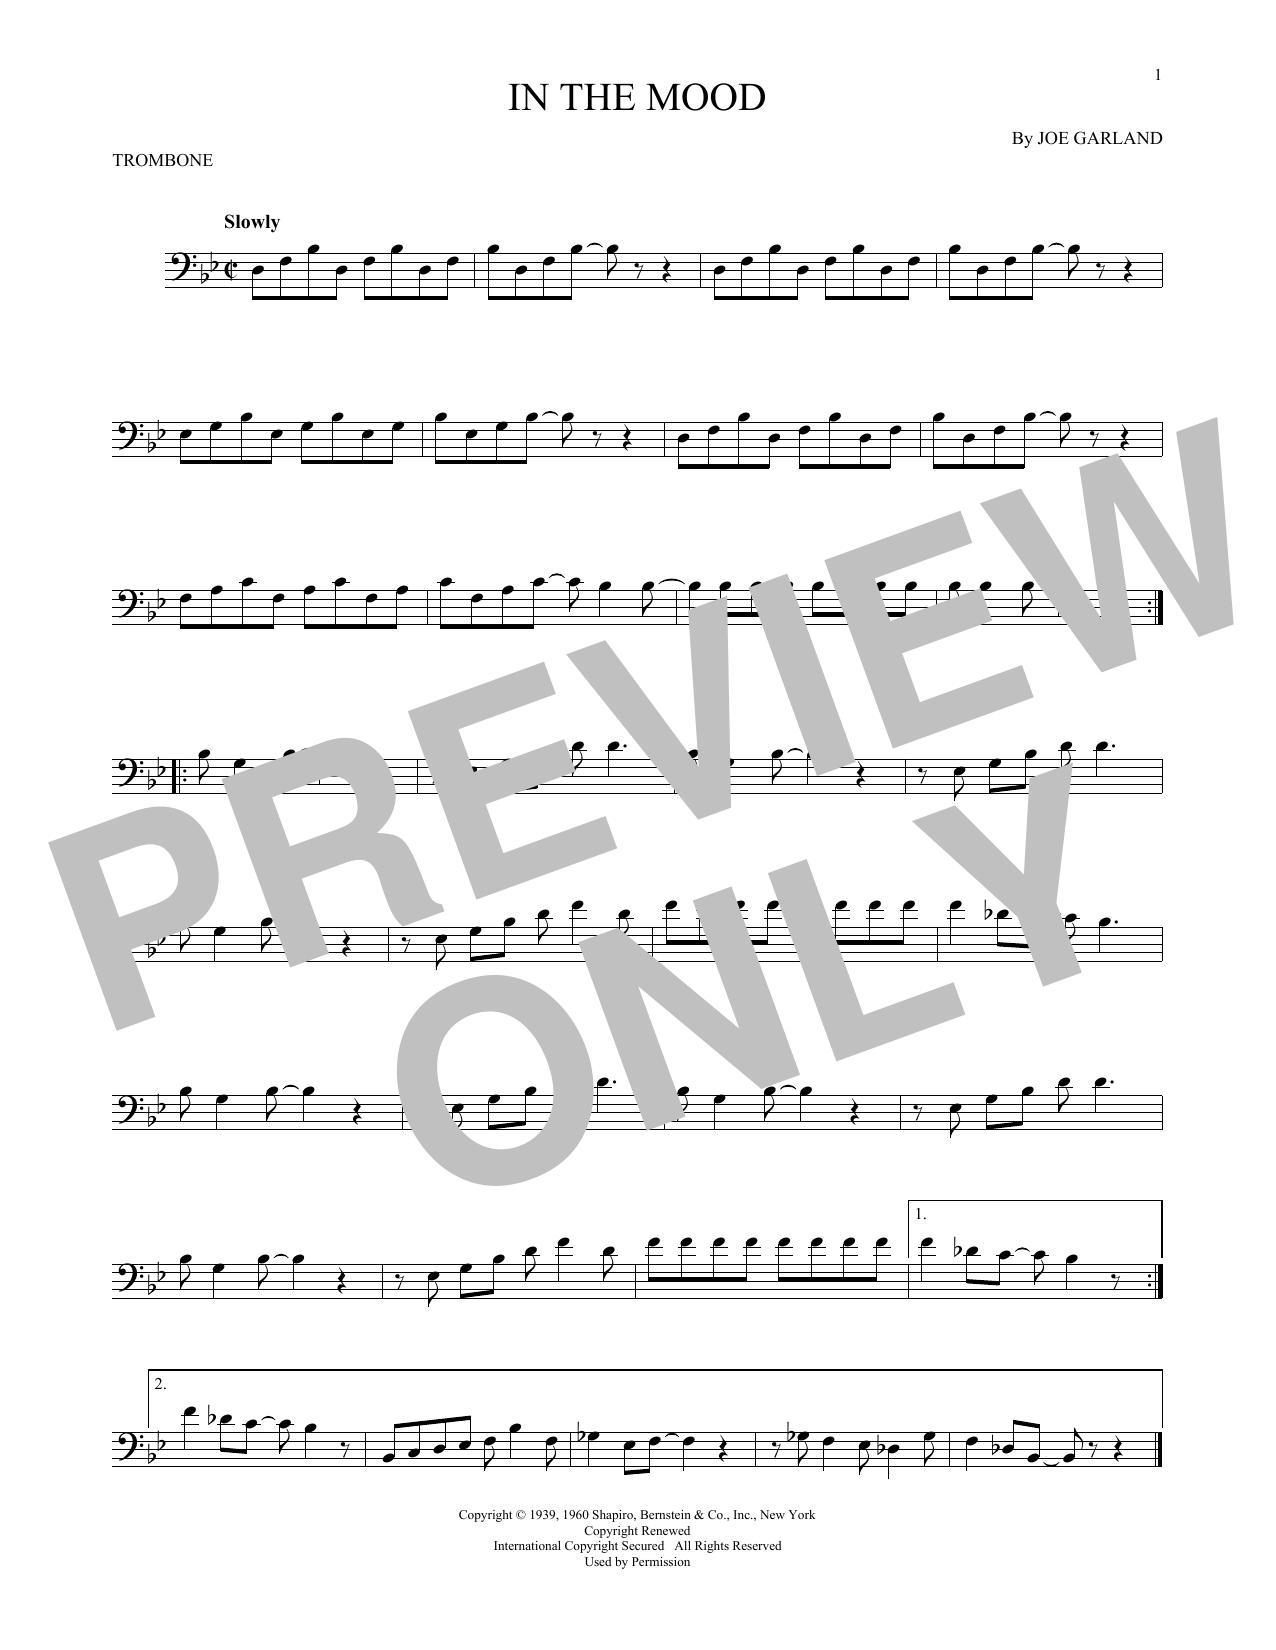 Joe Garland In The Mood sheet music notes and chords. Download Printable PDF.